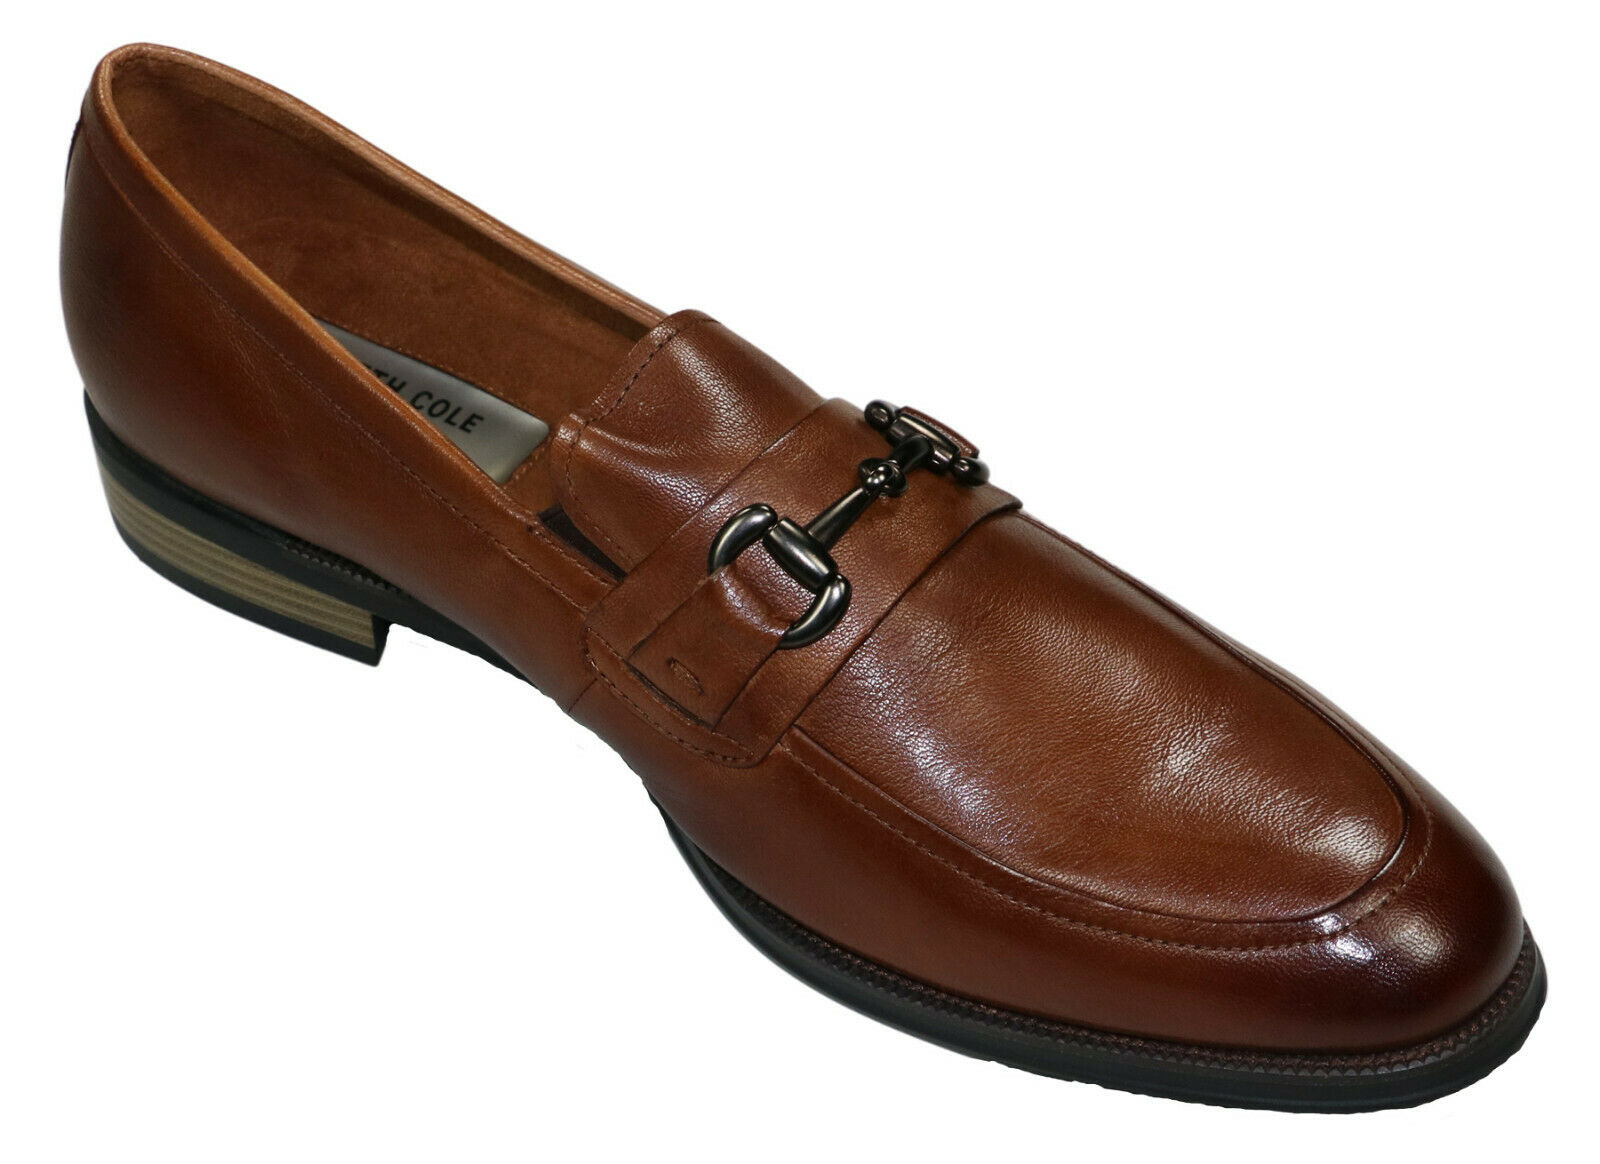 Kenneth Cole New York Genuine Leather Men's Brock Bit Loafer Size 13 NIB Cognac